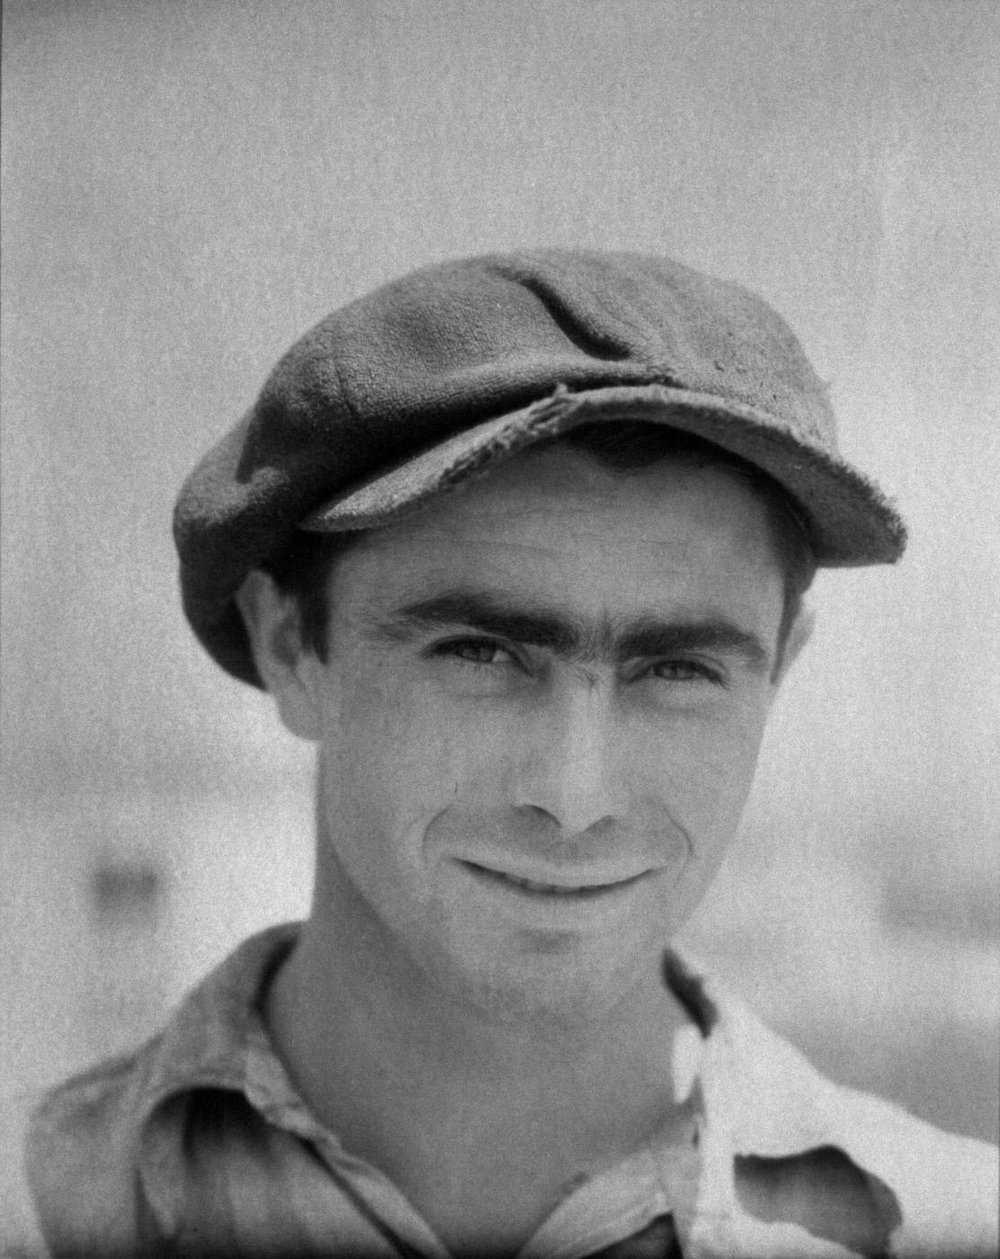 Walker Evans,  Construction Worker, Pennsylvania,  1935, Gift of Mr. Mead Kibbey and Mr. and Mrs. Howard Hays, Jr.